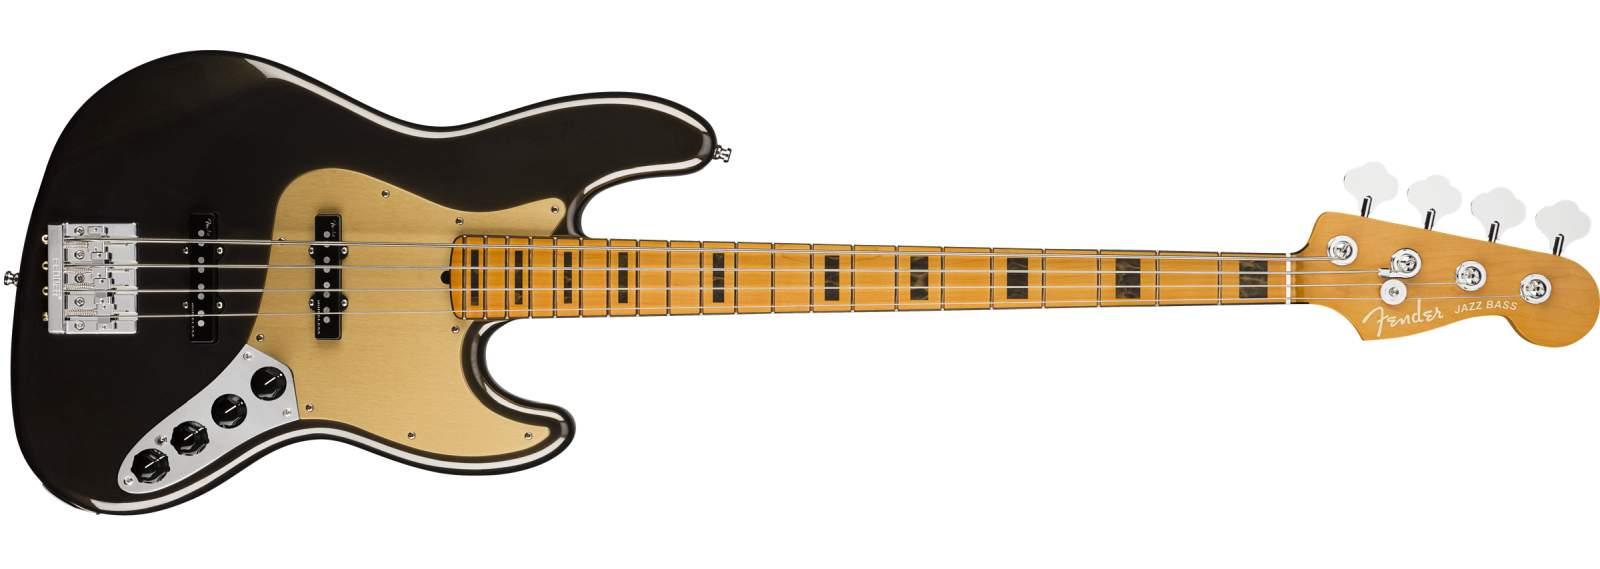 Fender American Ultra J-Bass MN TXT